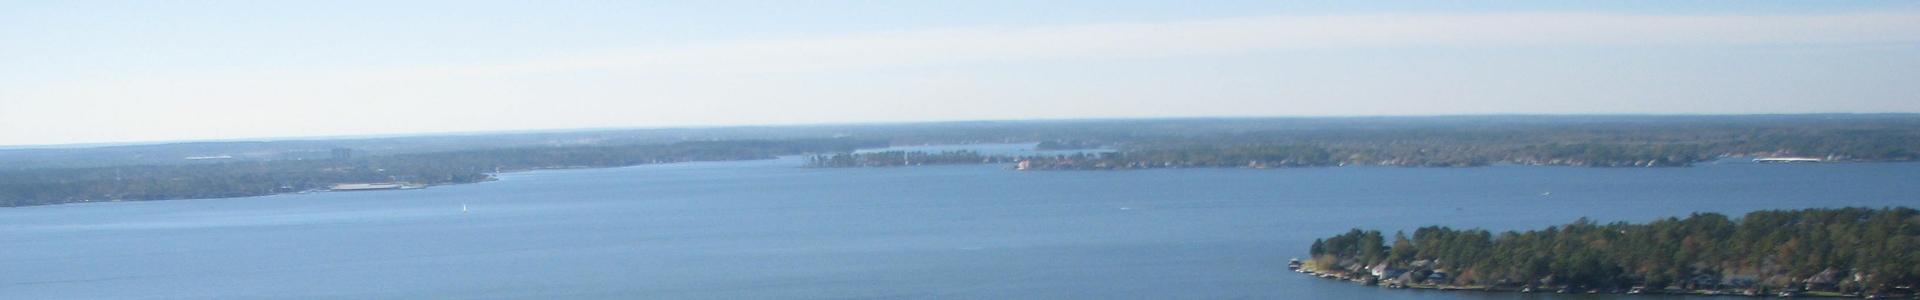 The Palms Marina on Lake Conroe